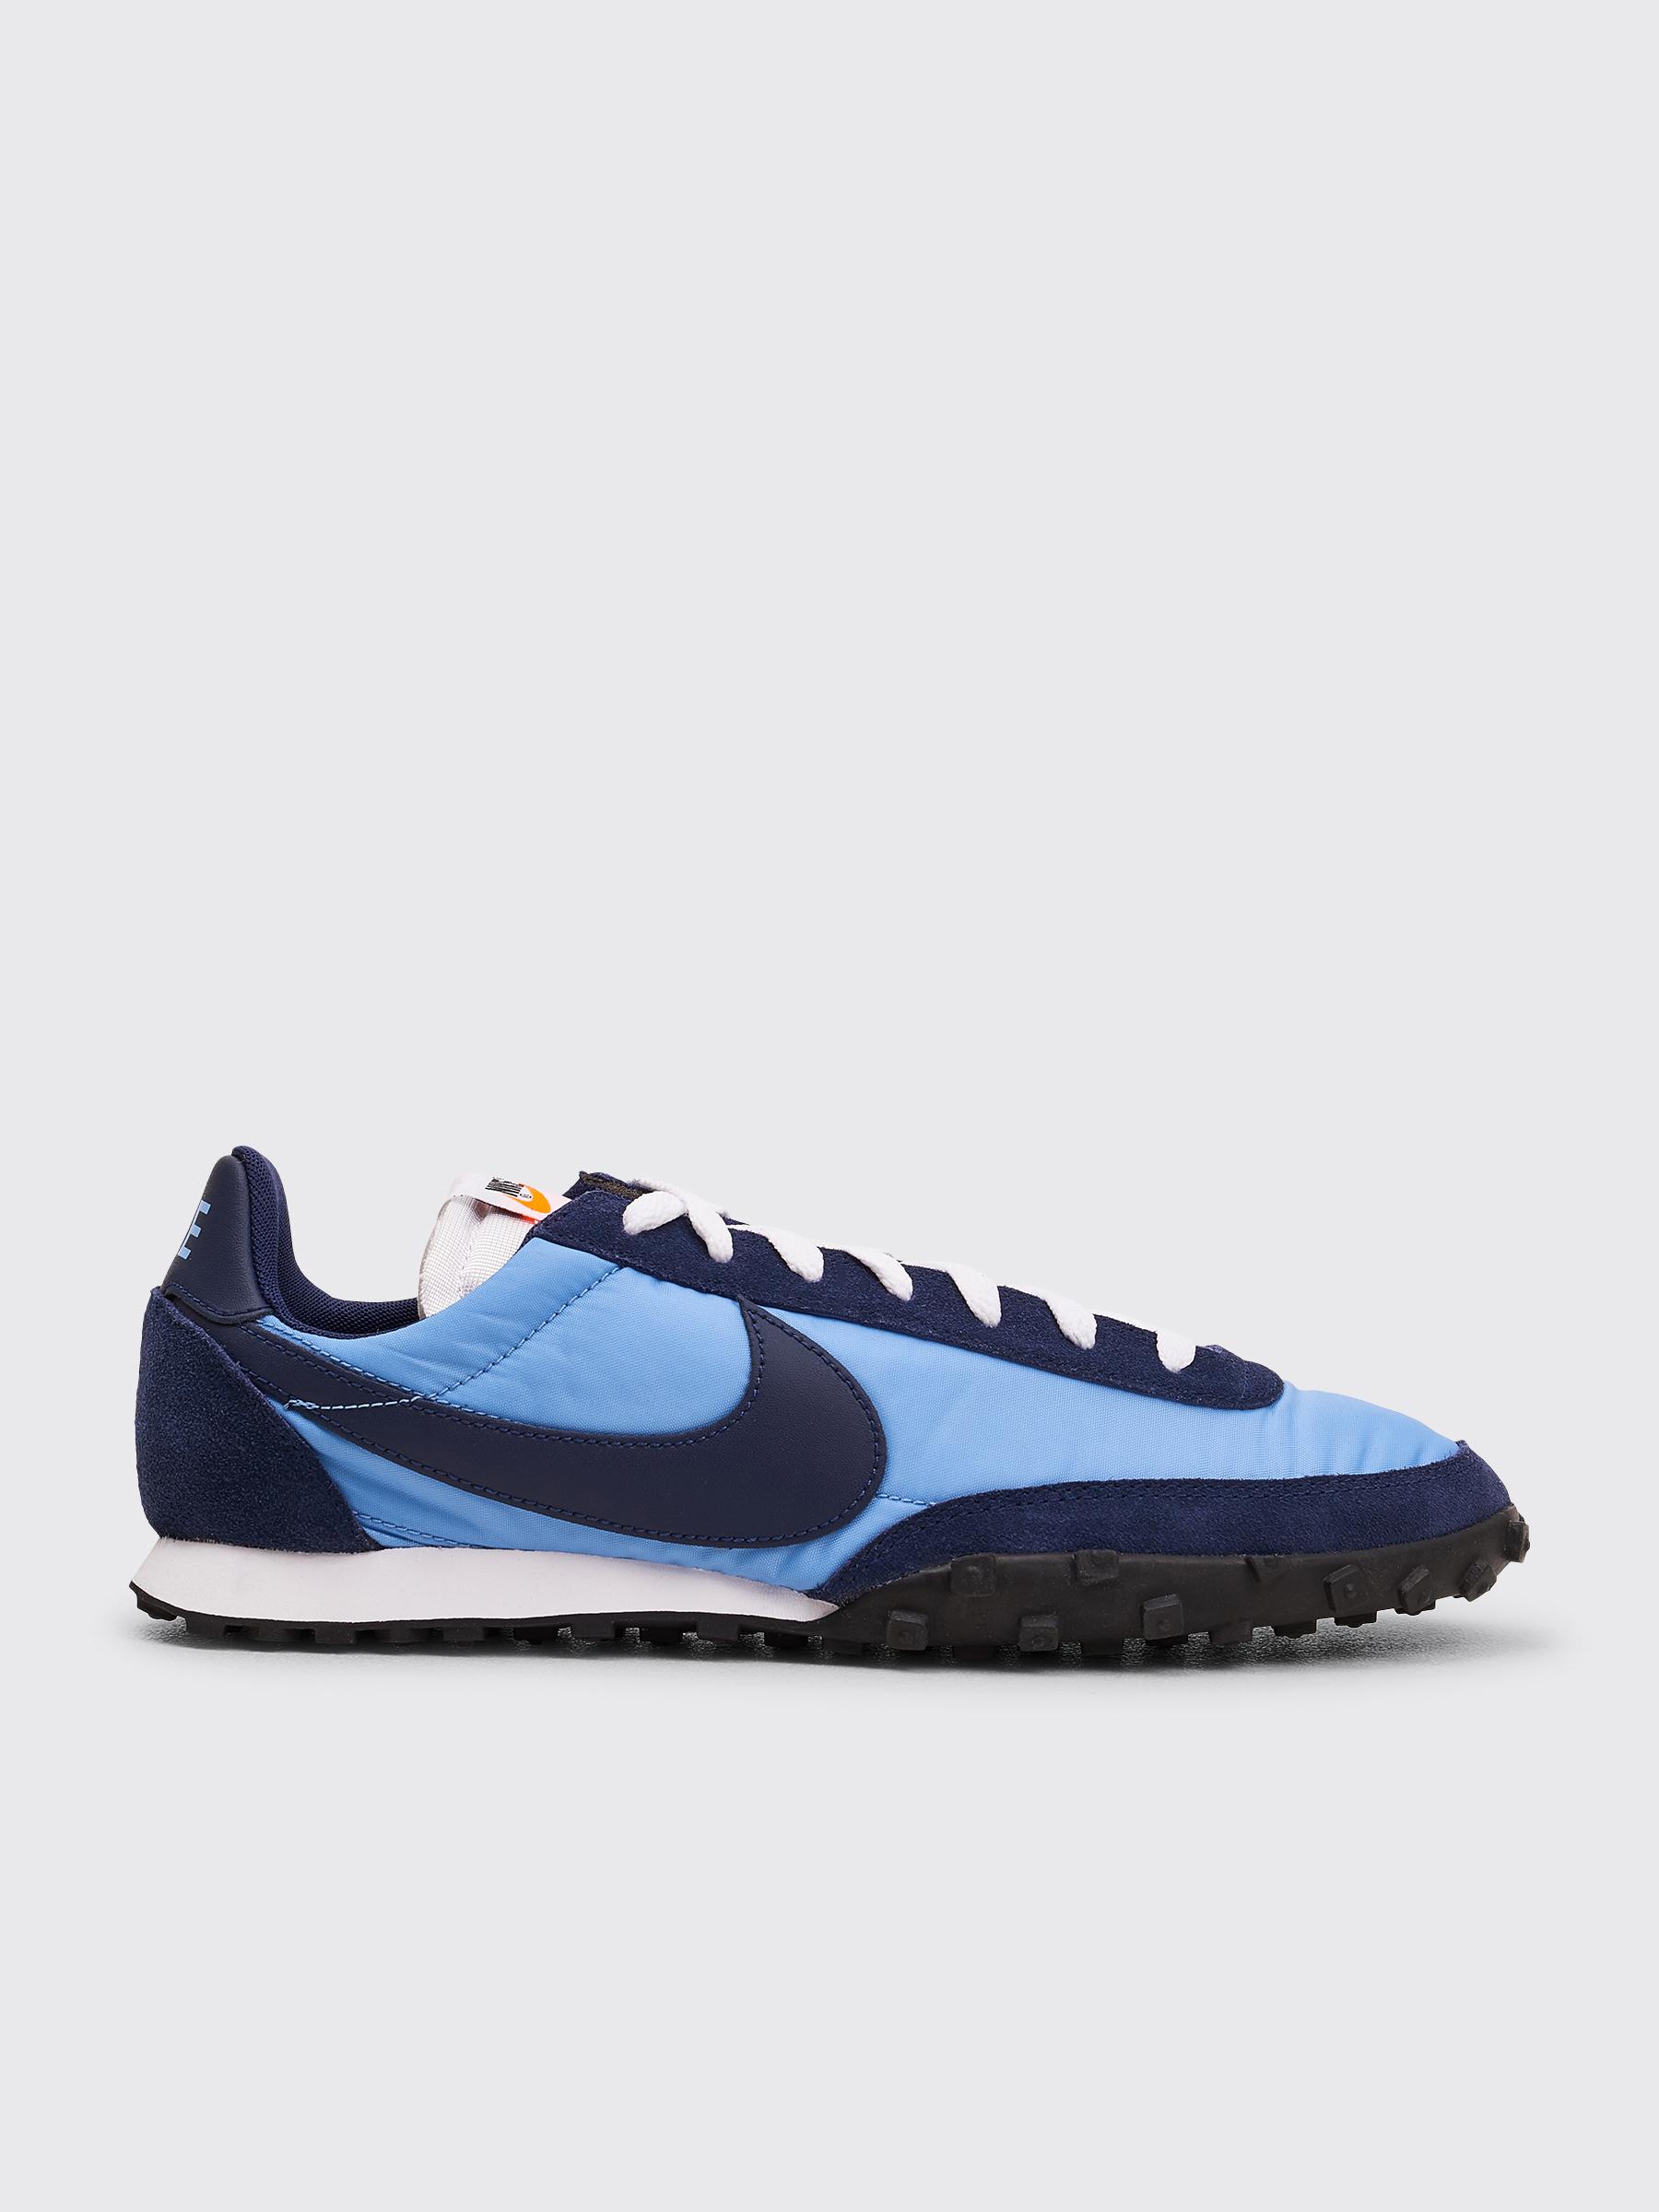 Nike Waffle Racer Light Blue Midnight Blue